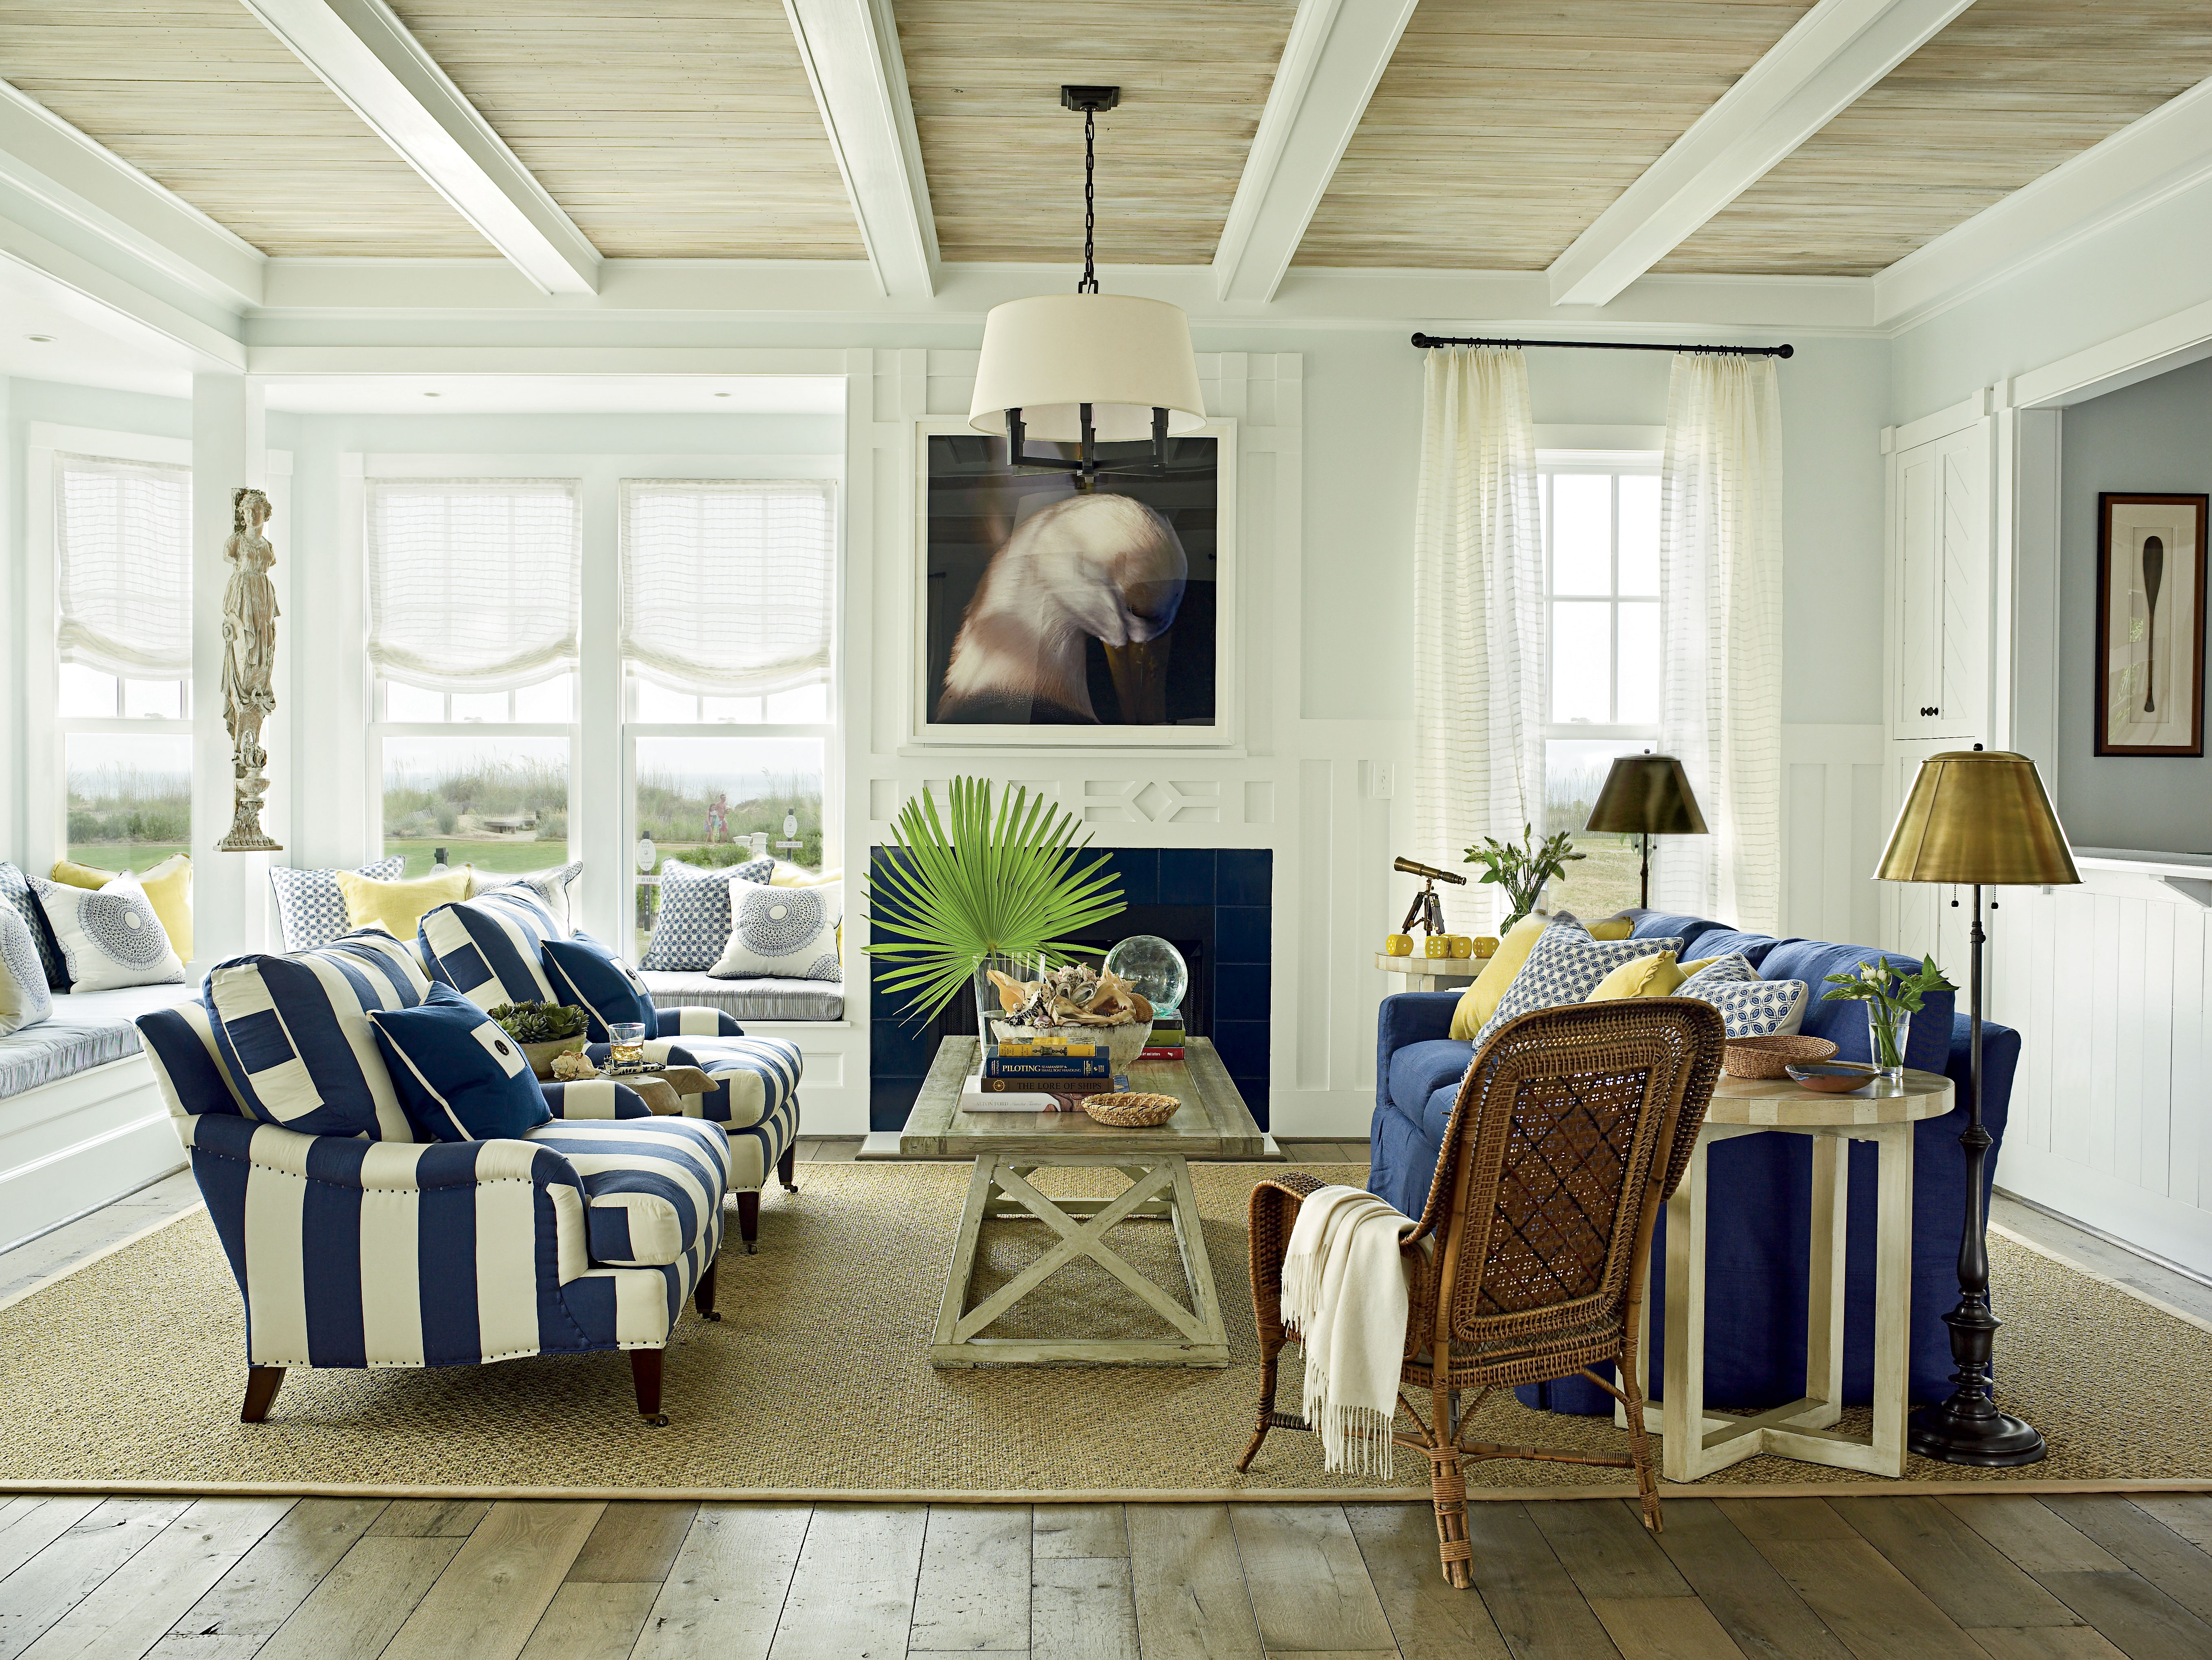 Interior Design For Beach Home Interior Design Of Delighful Interiors Inside Different Model E